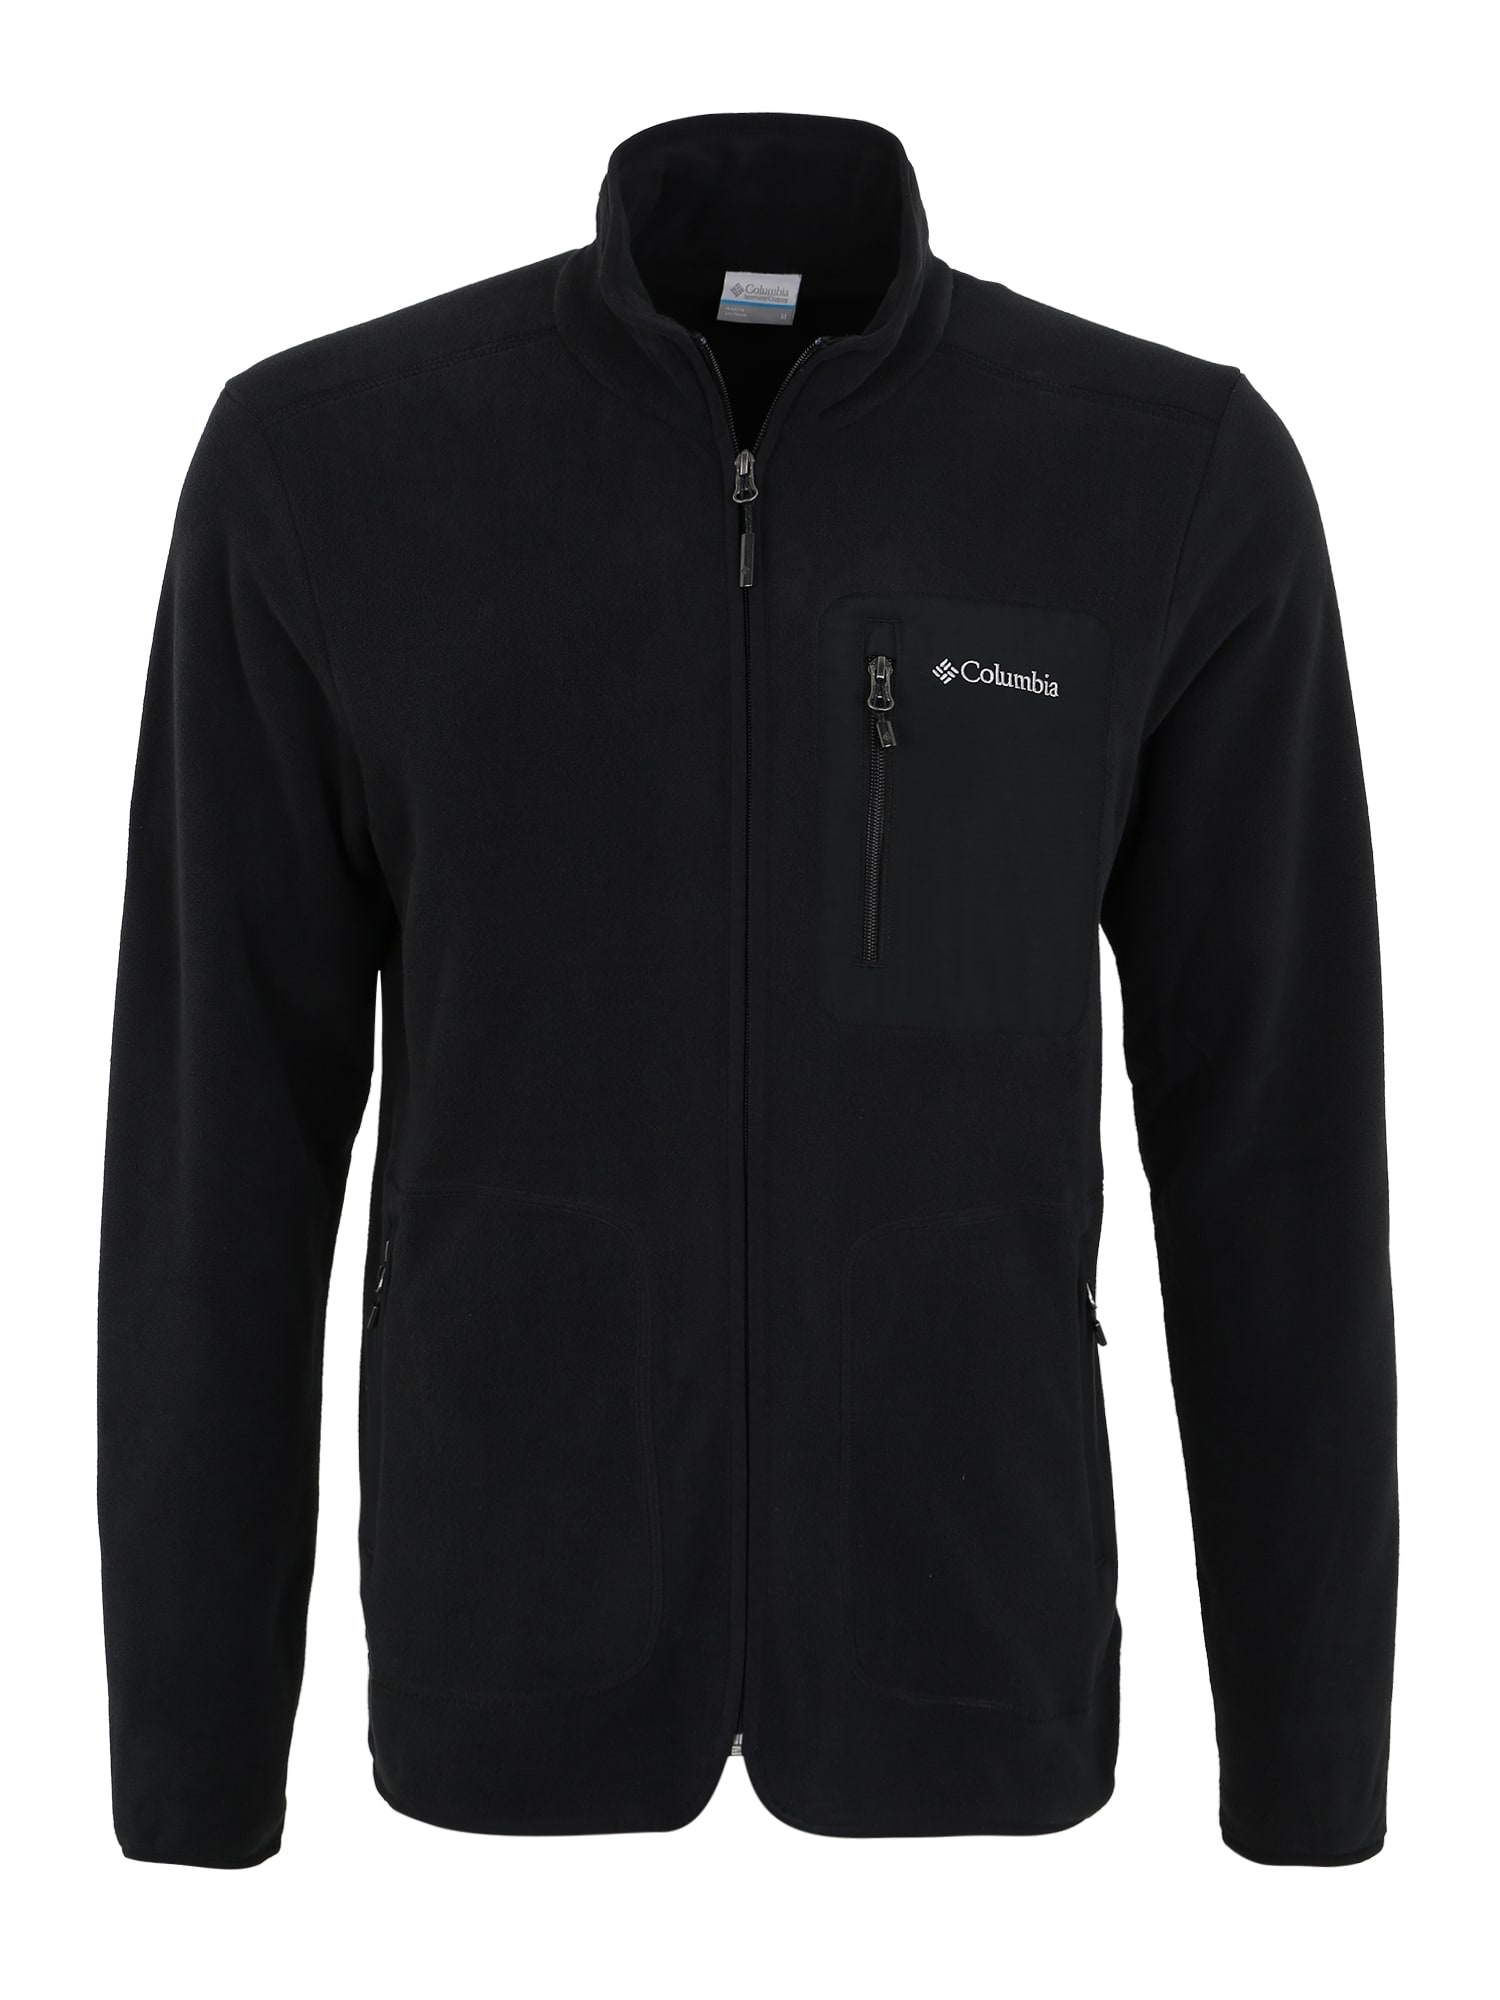 COLUMBIA Funkcinis flisinis džemperis 'Exploration FZ Fleece' juoda